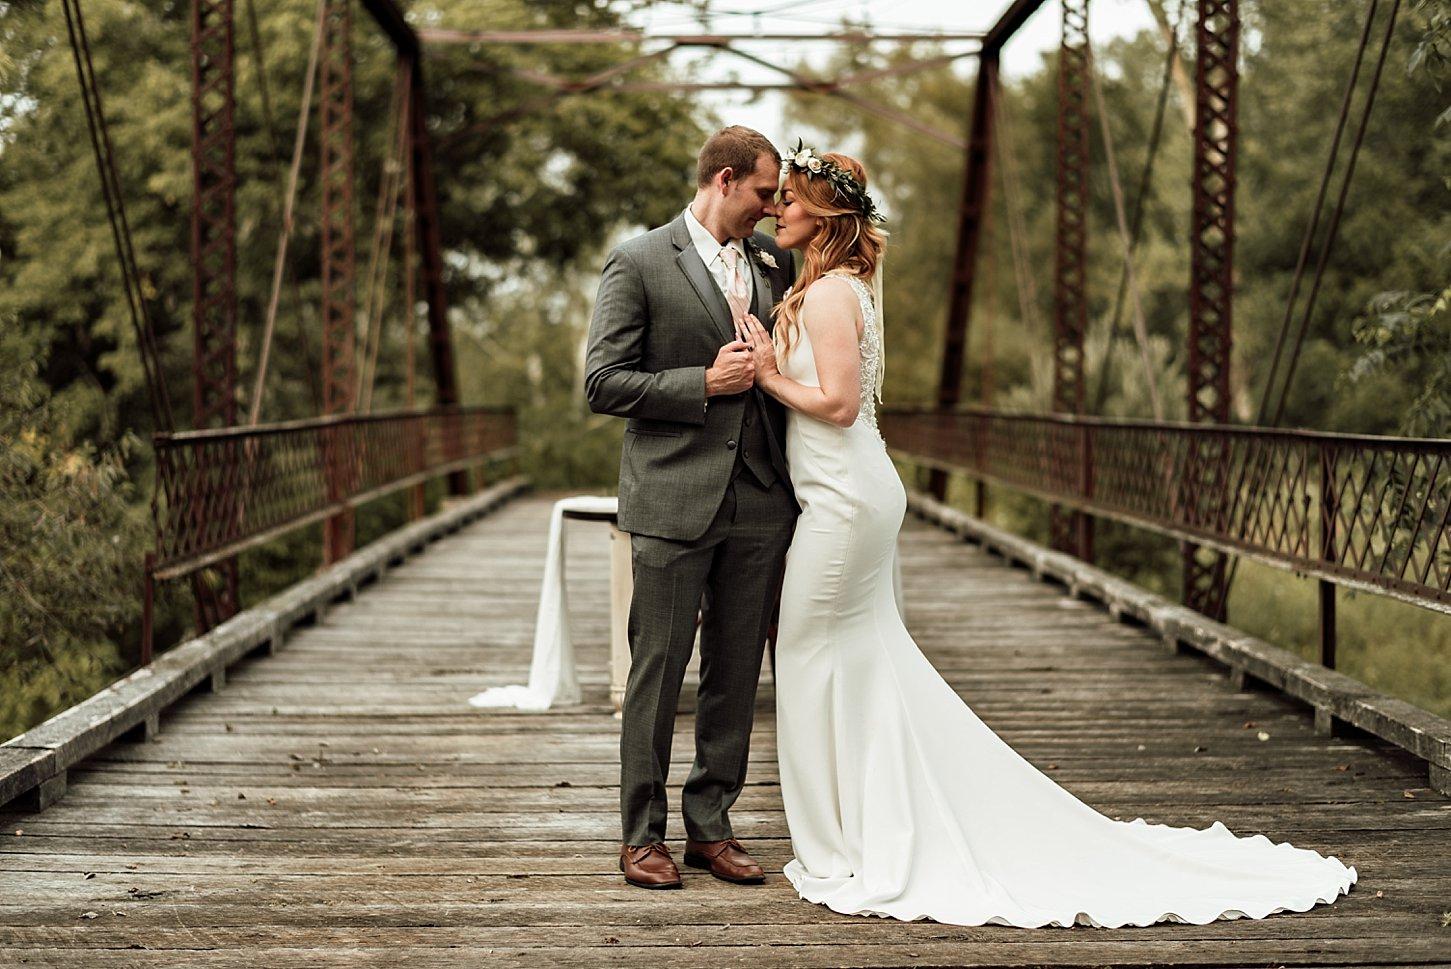 Givens farm hortonville green bay photographer carlee secor wedding photography boho